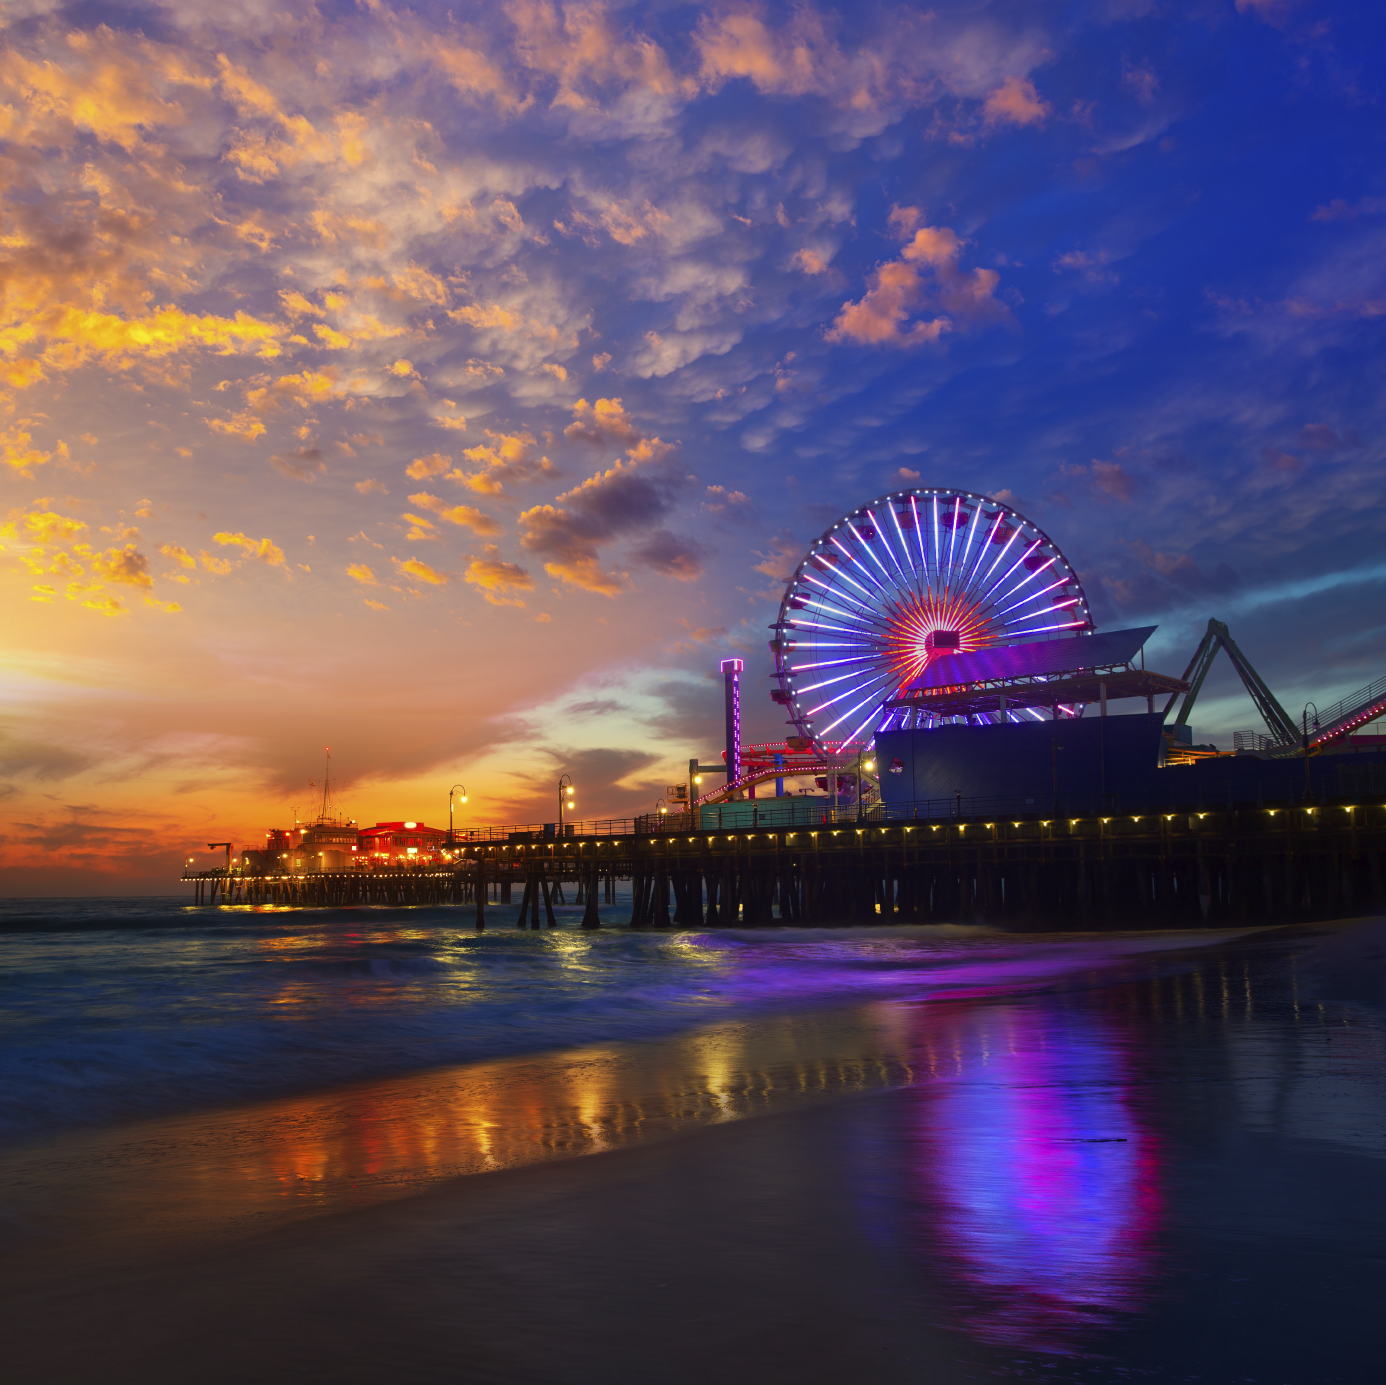 Santa_Monica_Sunset_iStock_000039840258_Medium.jpg